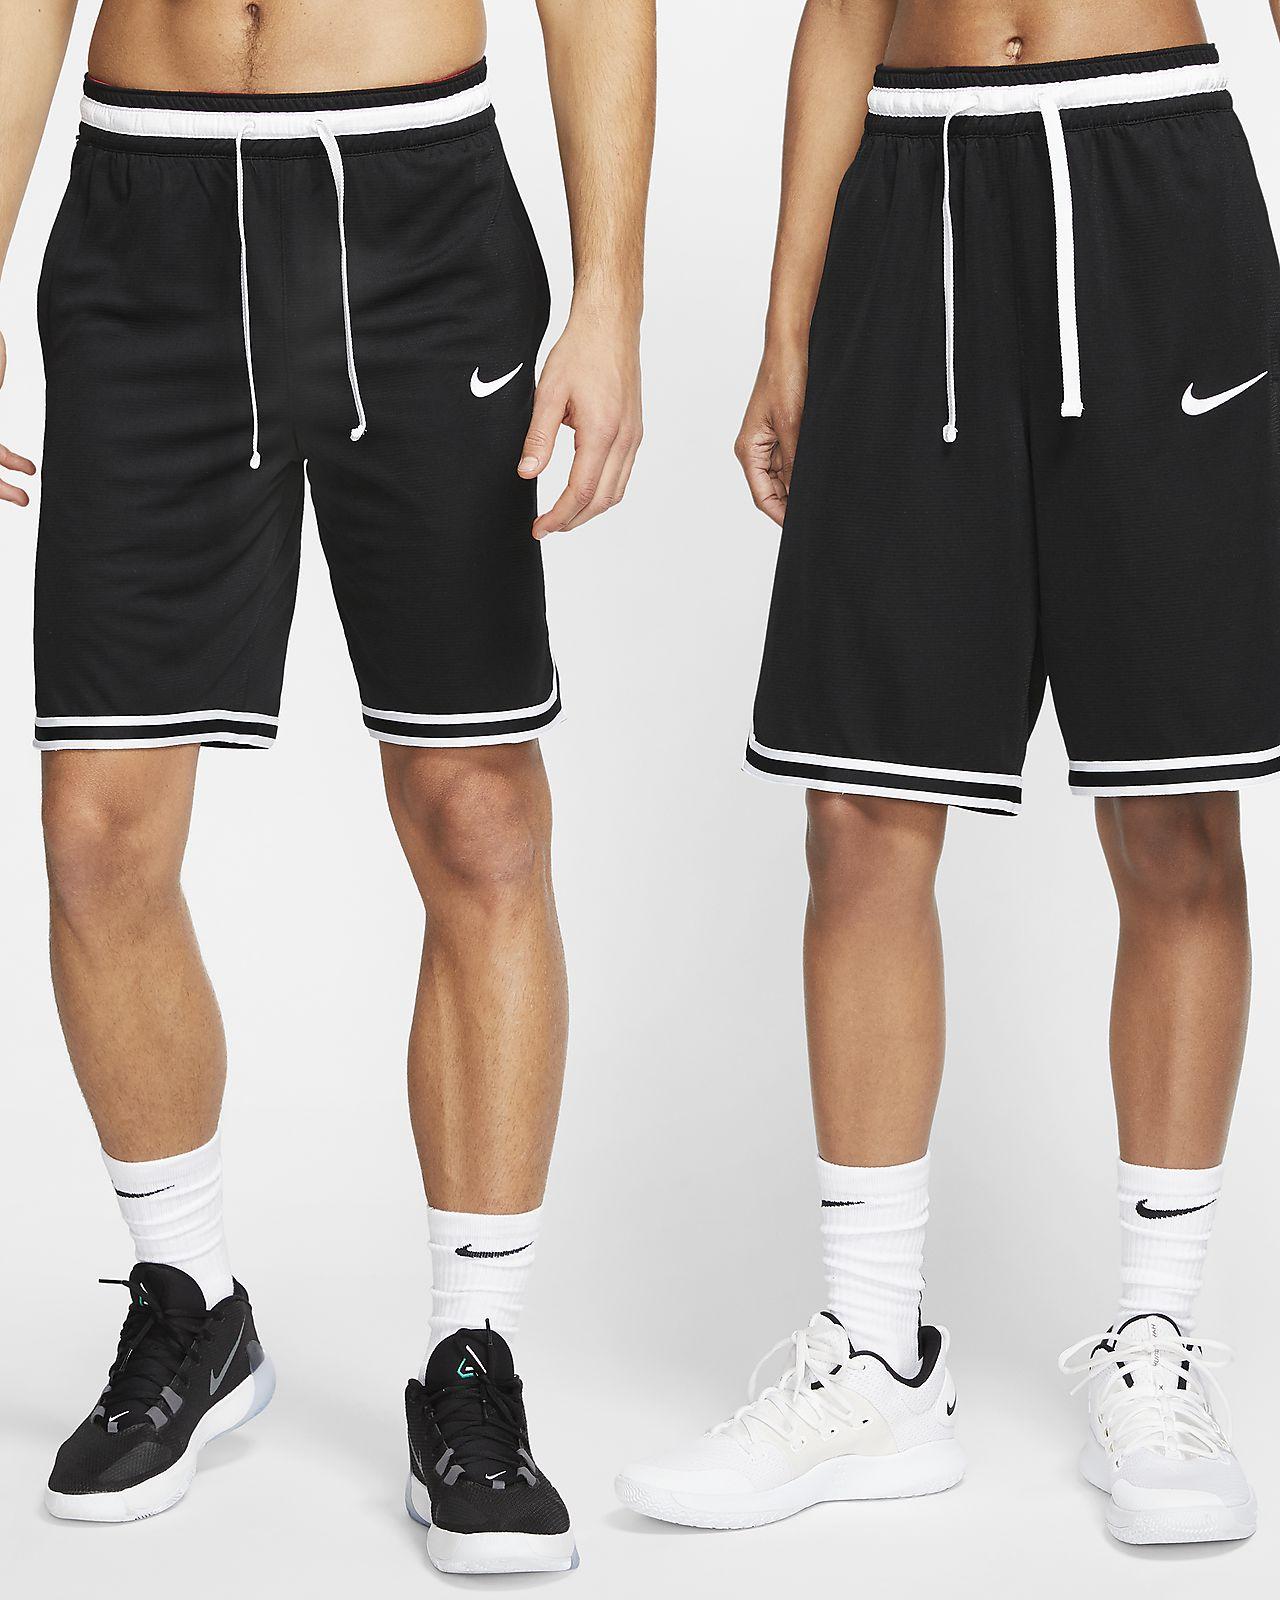 f29b5c4dbce9e Nike Dri-FIT DNA Men's Basketball Shorts. Nike.com